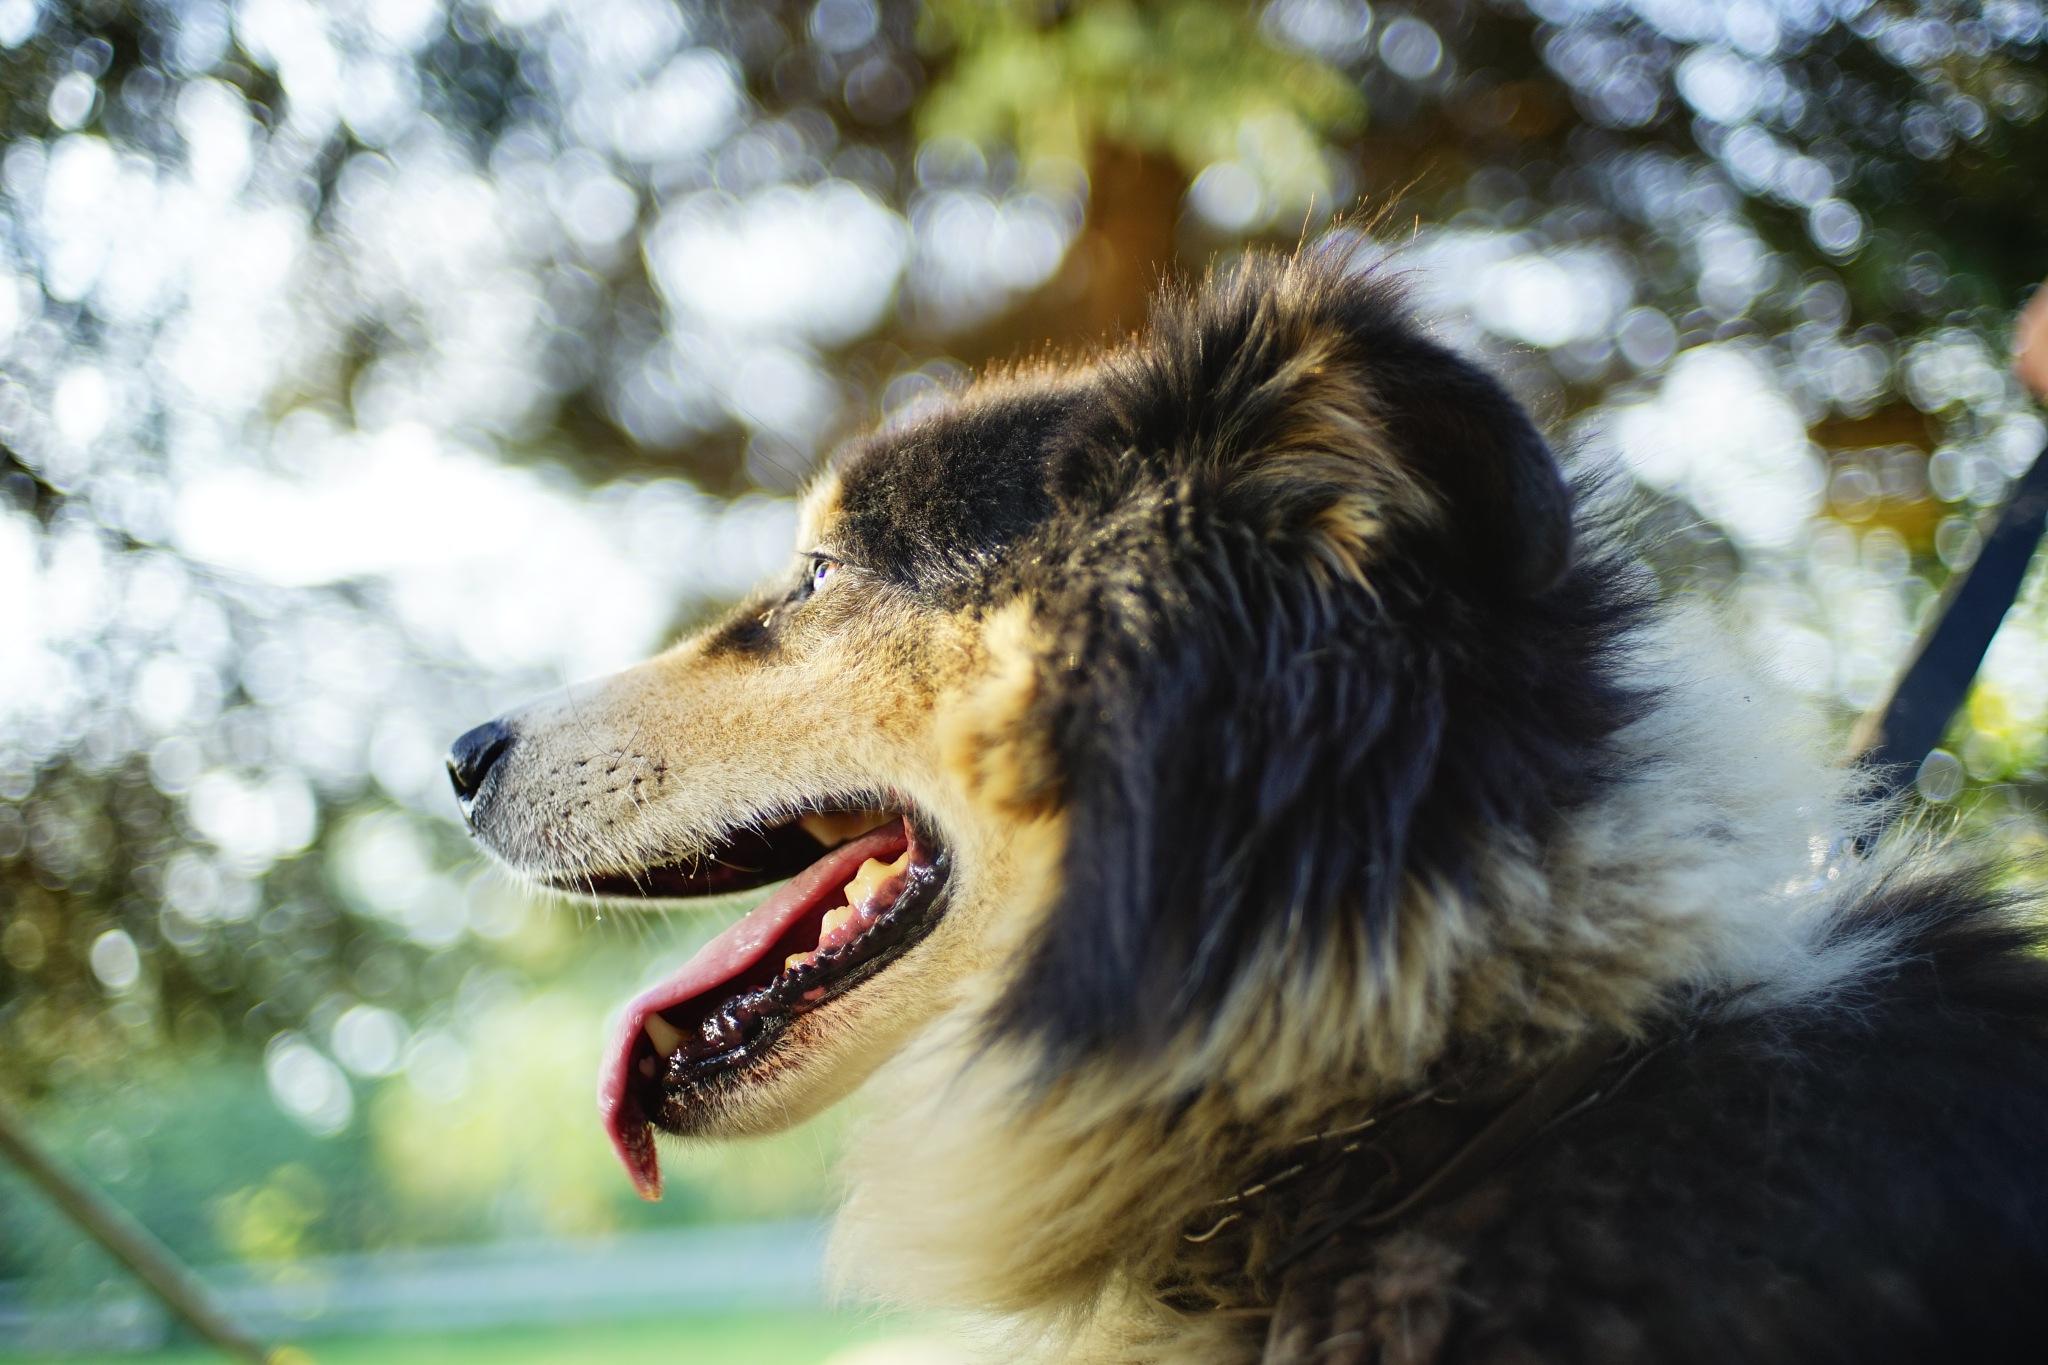 portrait of the doggy by Stanislaw Bomba